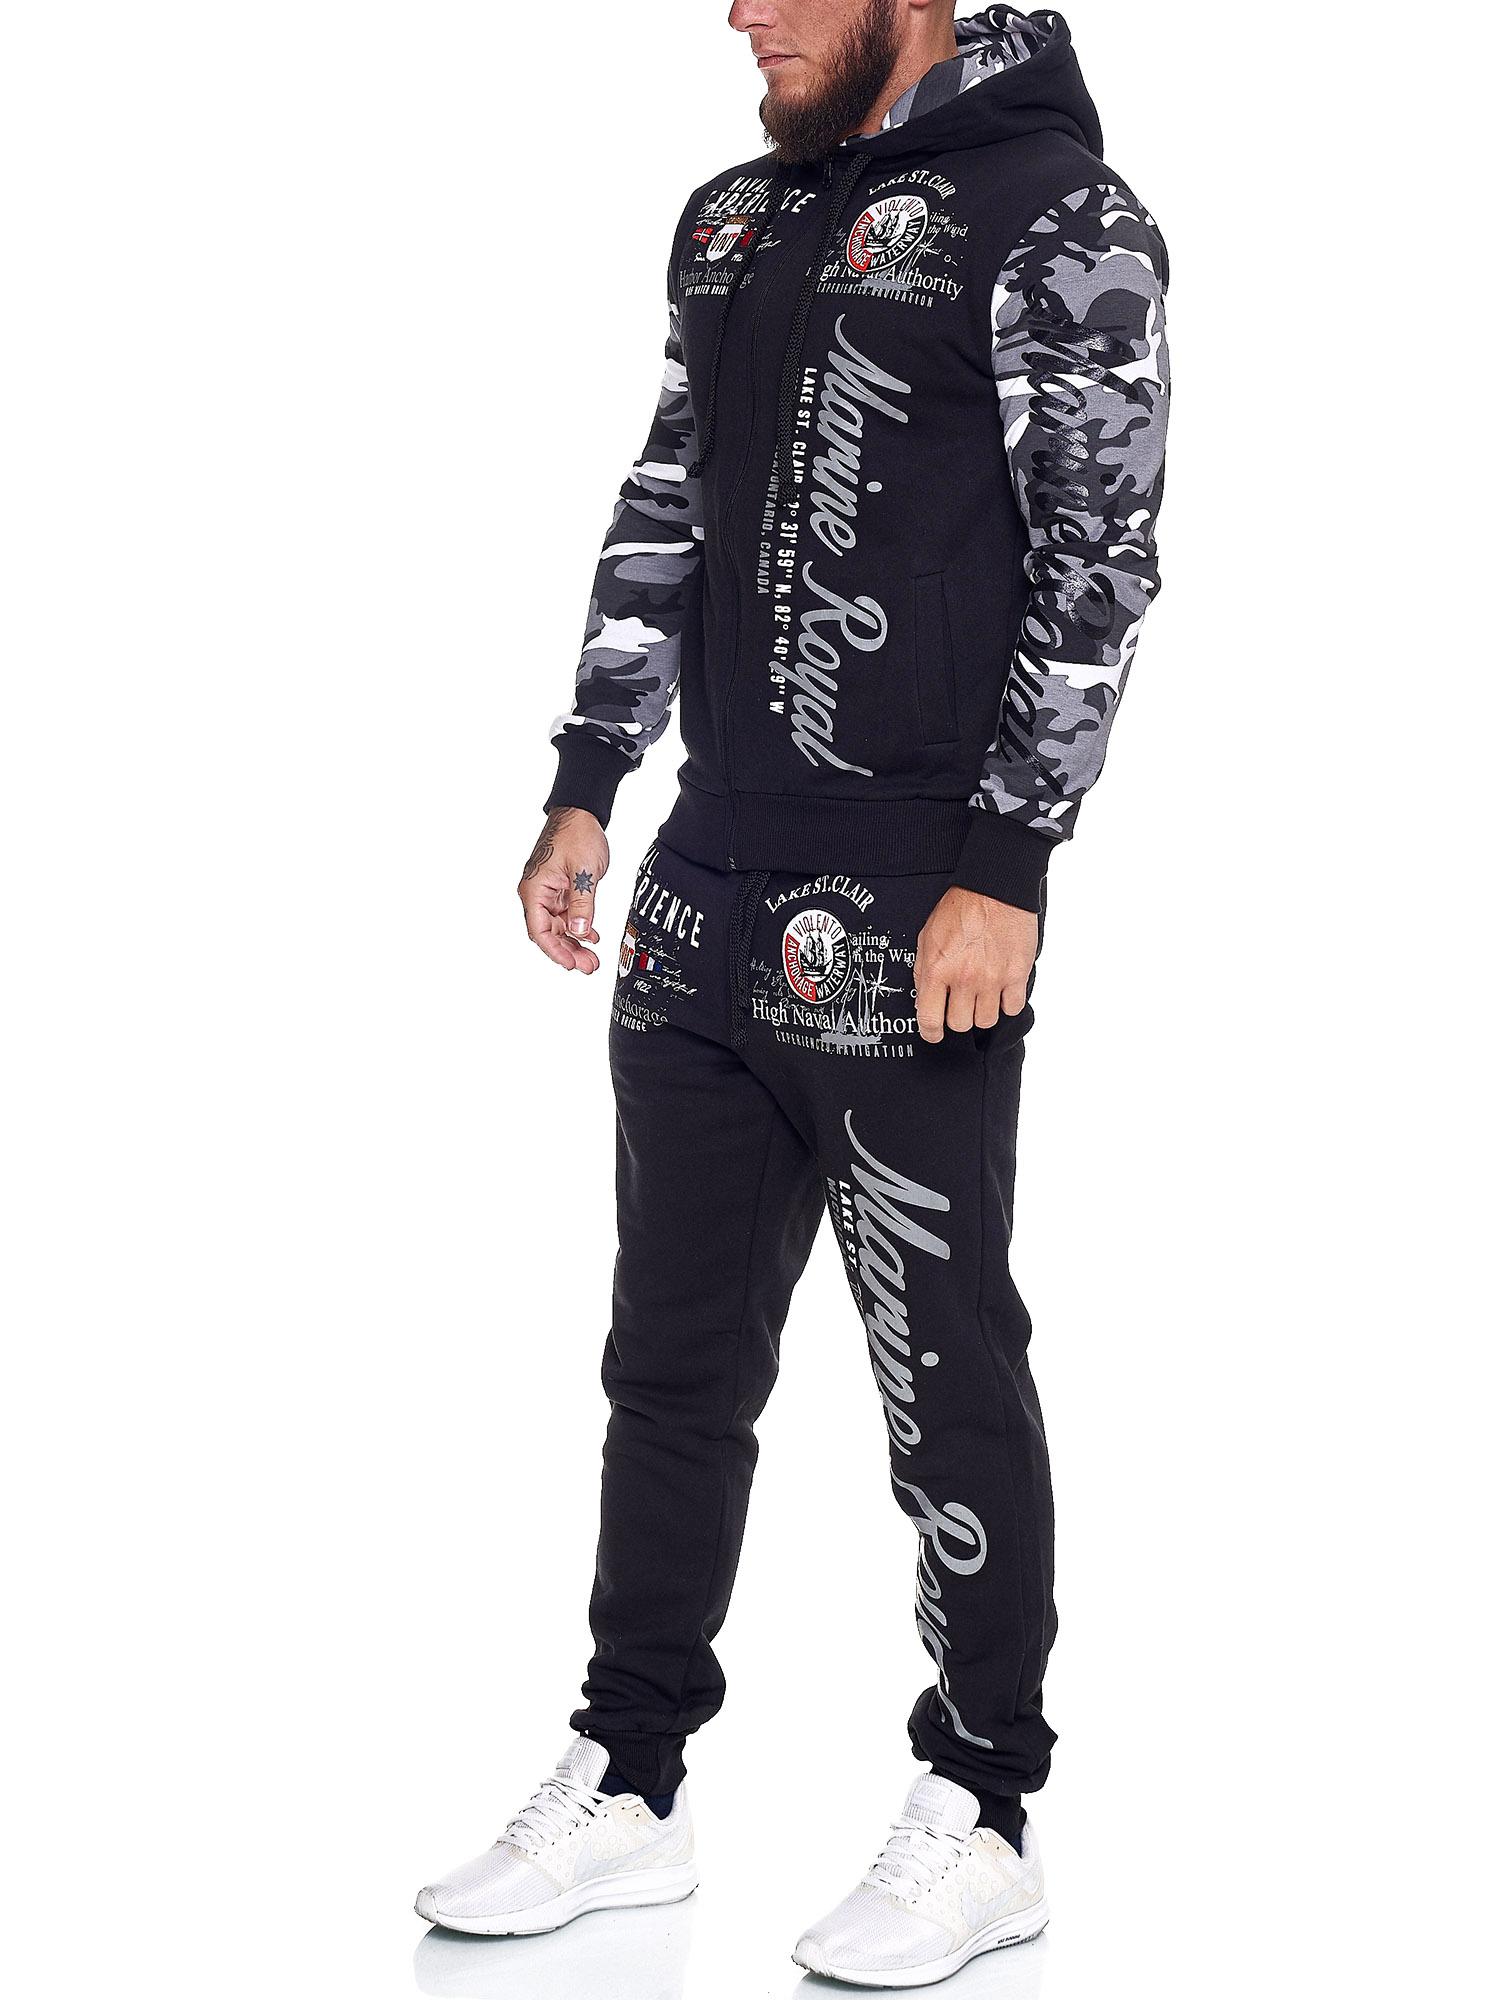 Damen-Jogginganzug-Frauen-Trainingsanzug-Sportanzug-Streetwear-JG-512-John-Kayna Indexbild 50